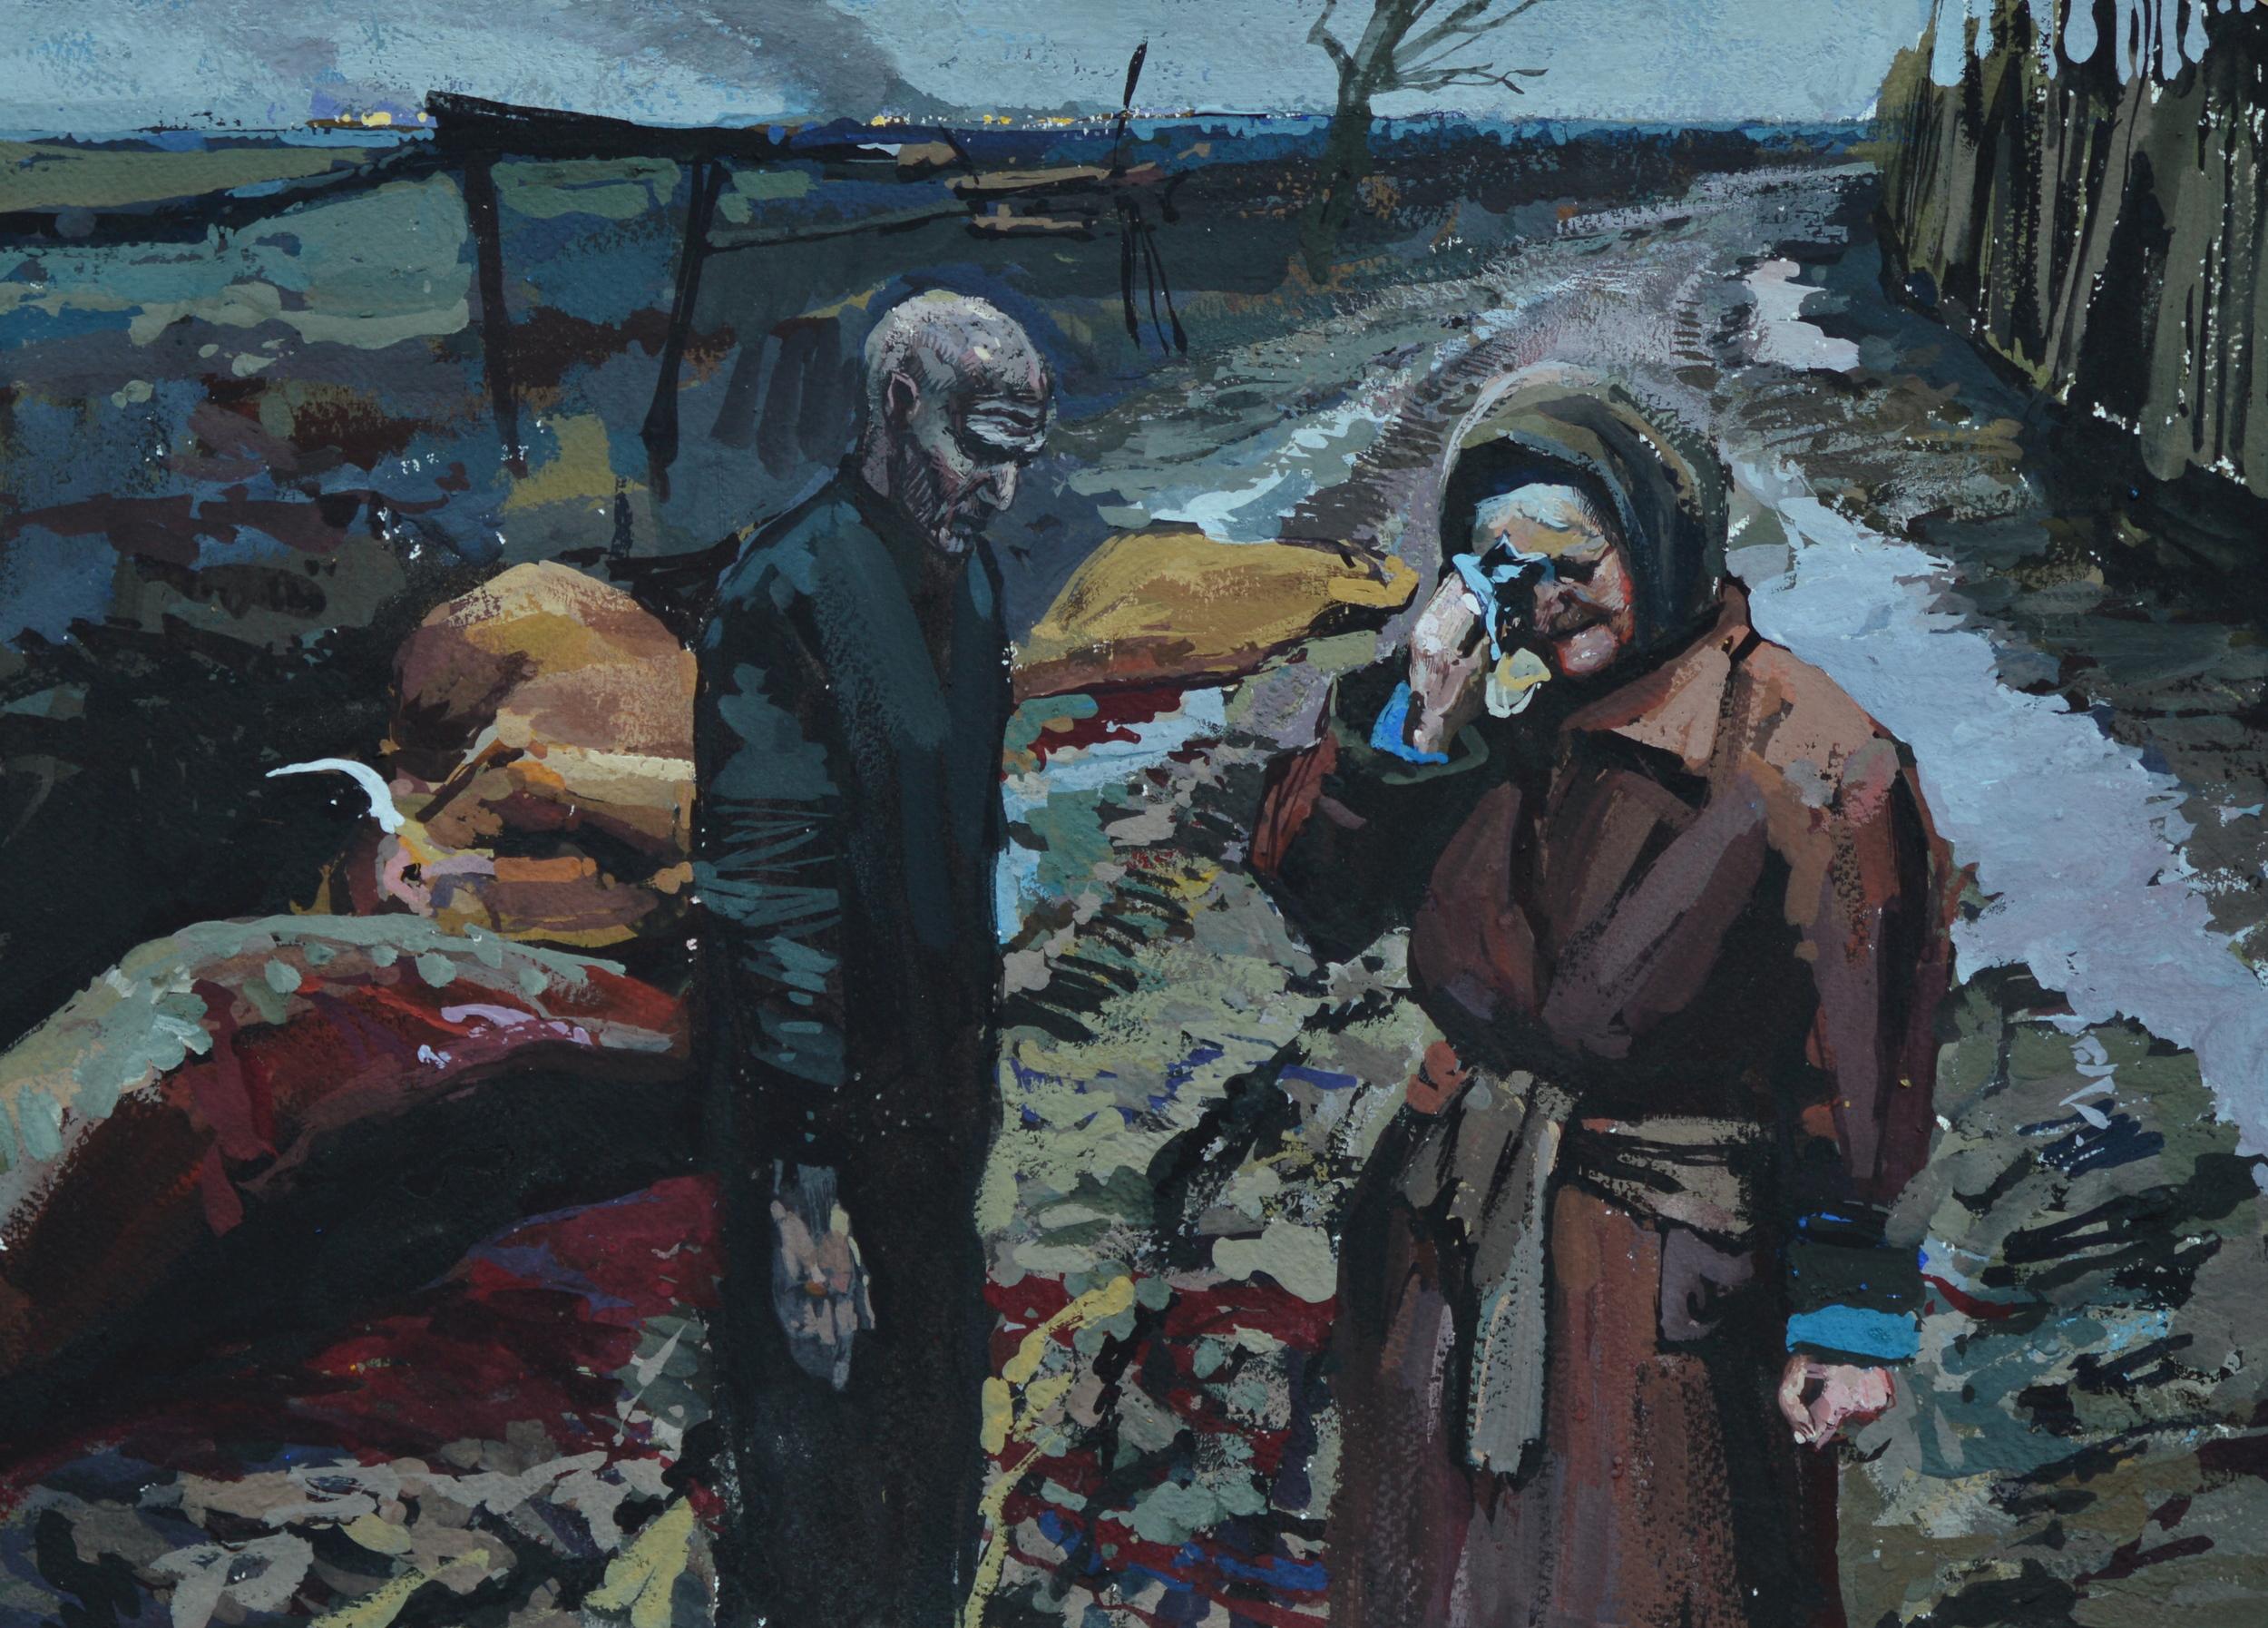 "Timur Akhriev  Title:What's Left (Study)  11"" x 14"" Gouache on Watercolor Paper. 2010. Sold"